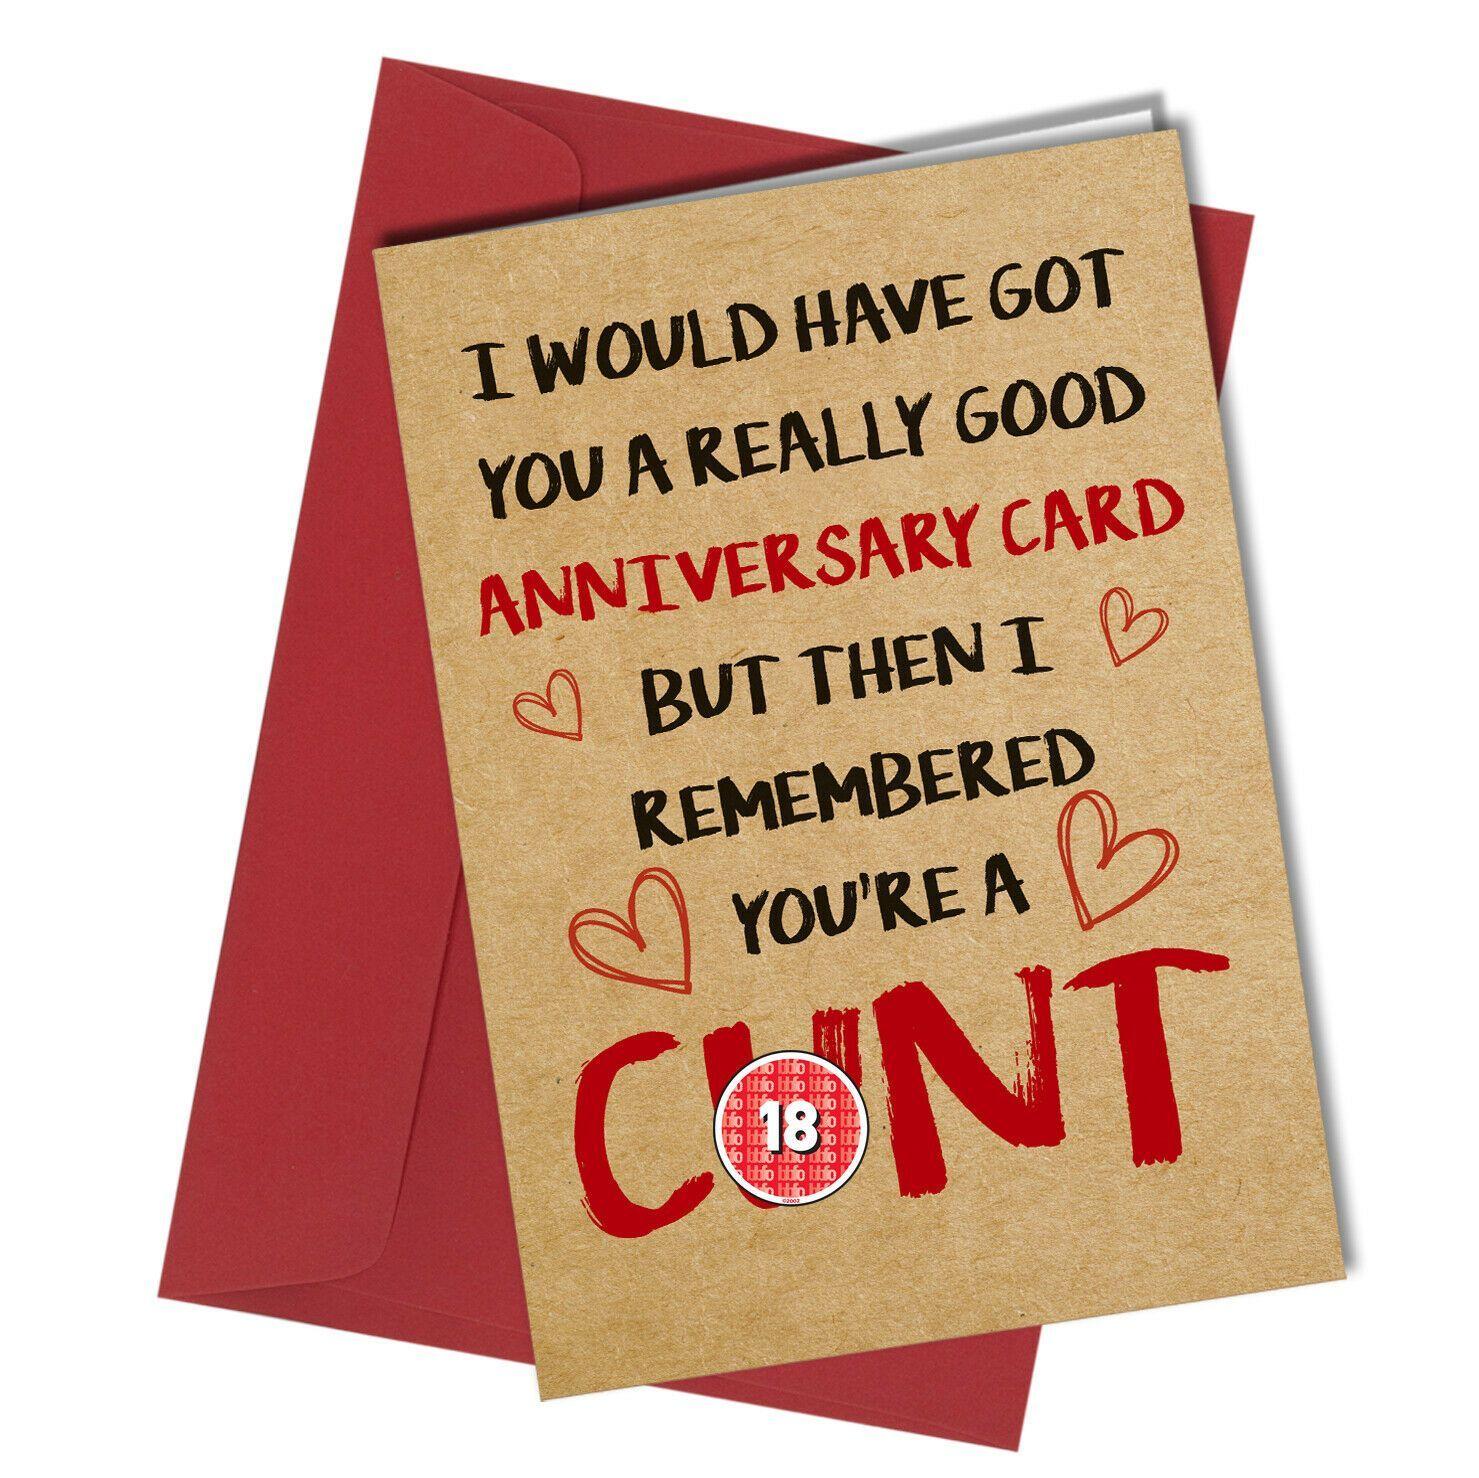 Cunt - #1268 Anniversary